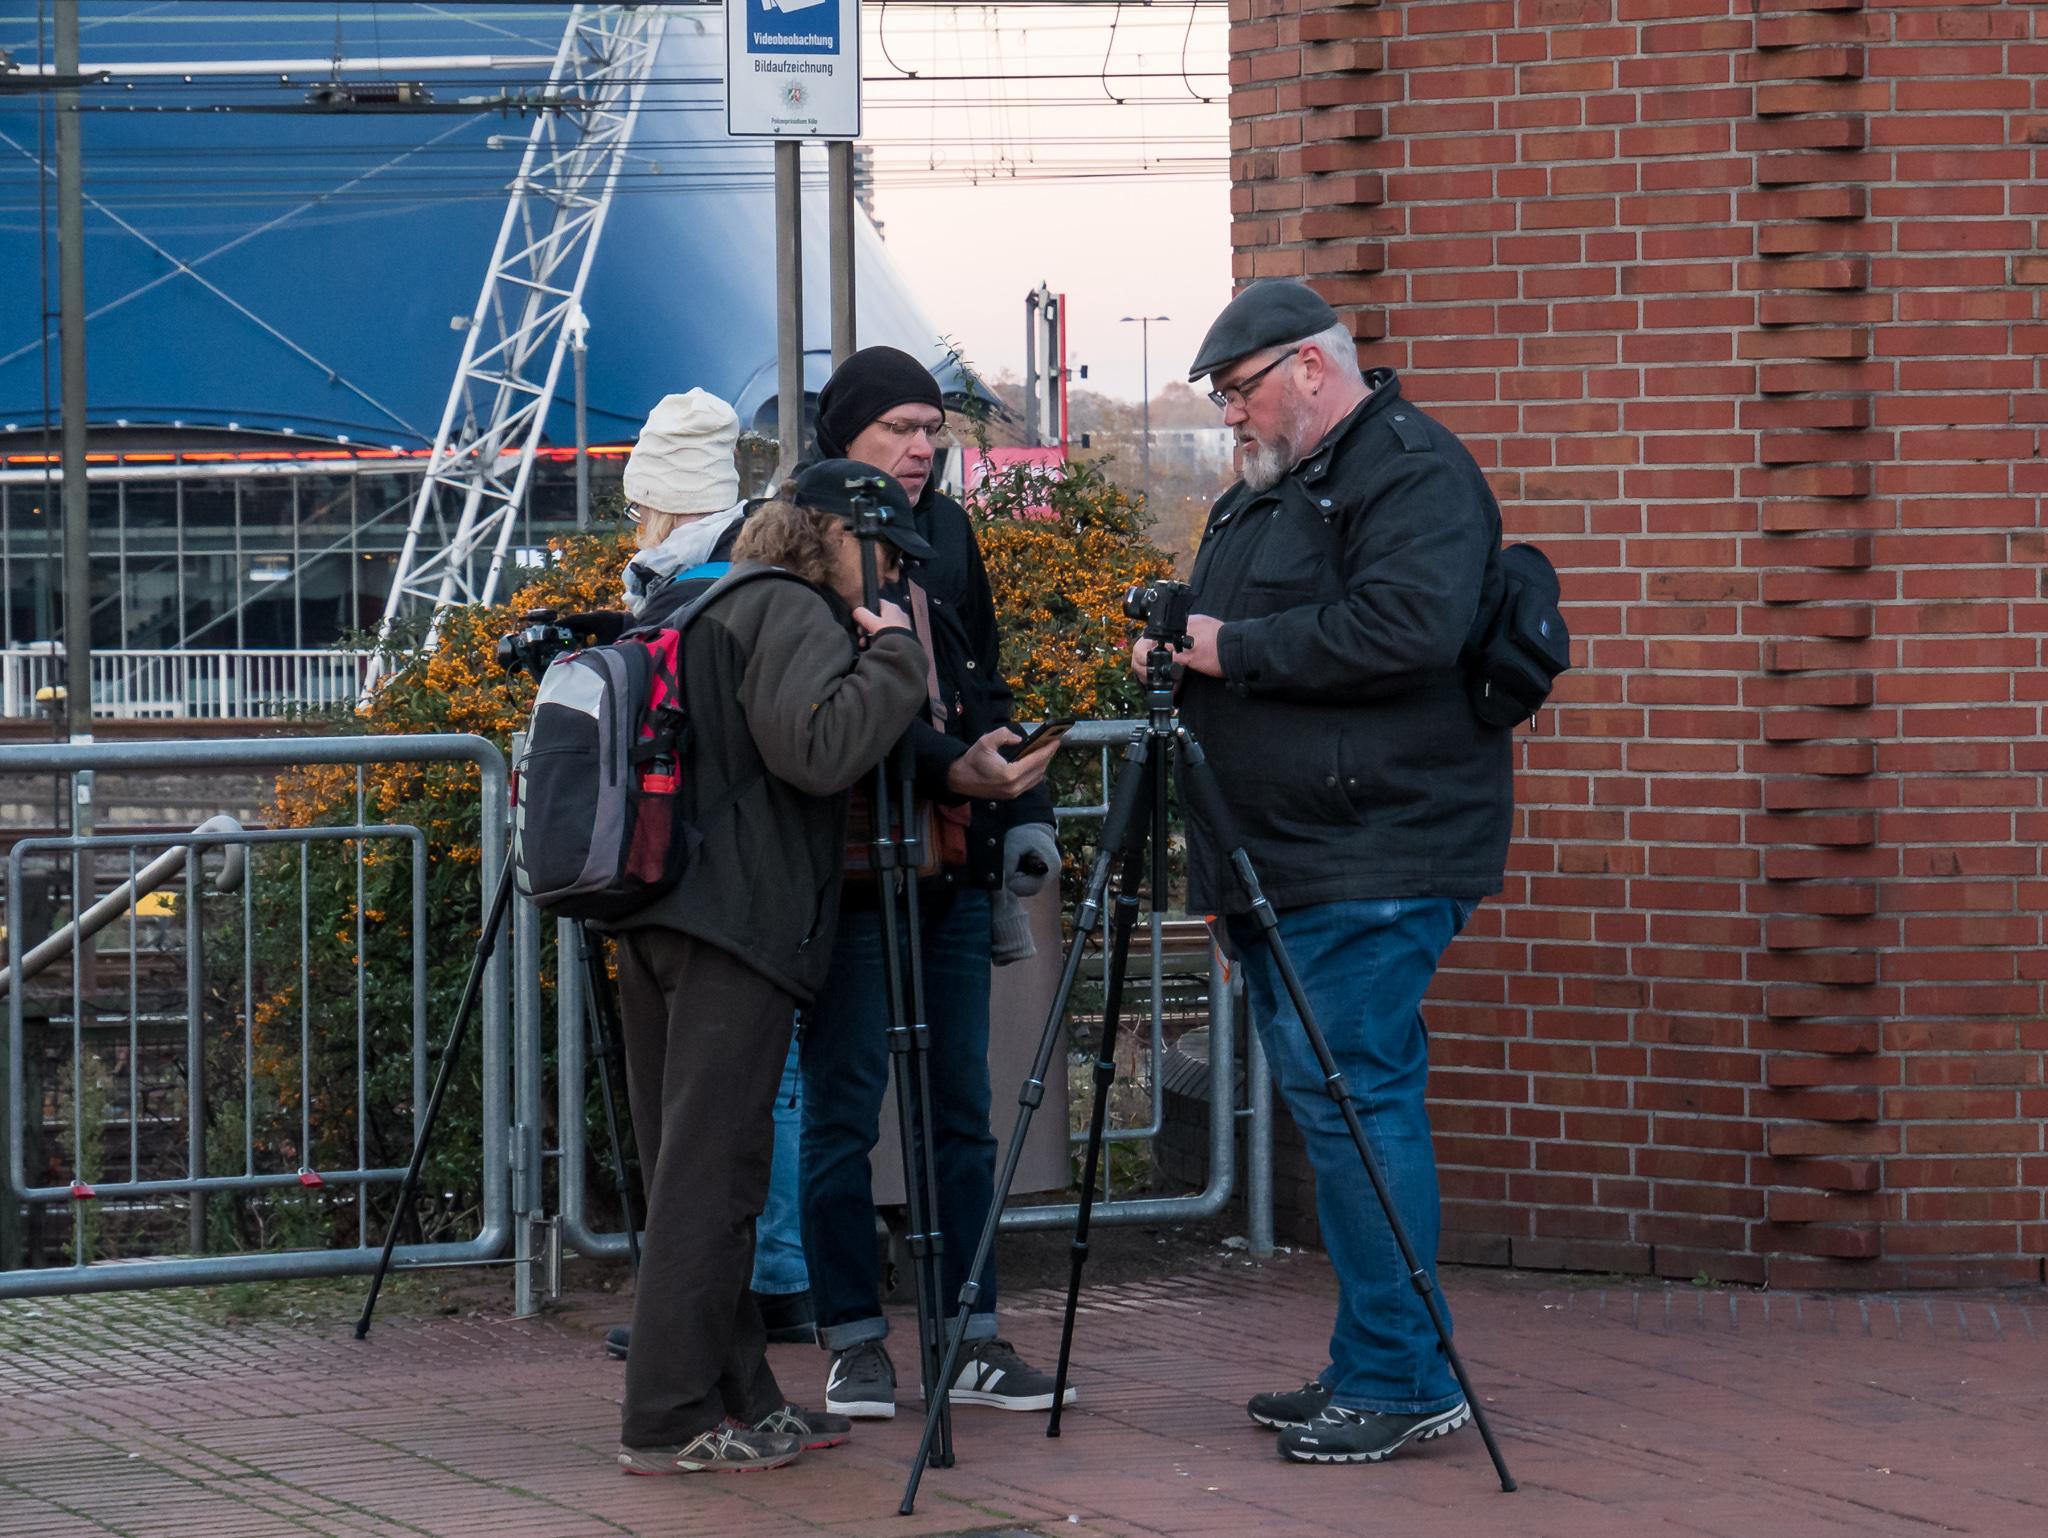 21. Photowalk Reportage